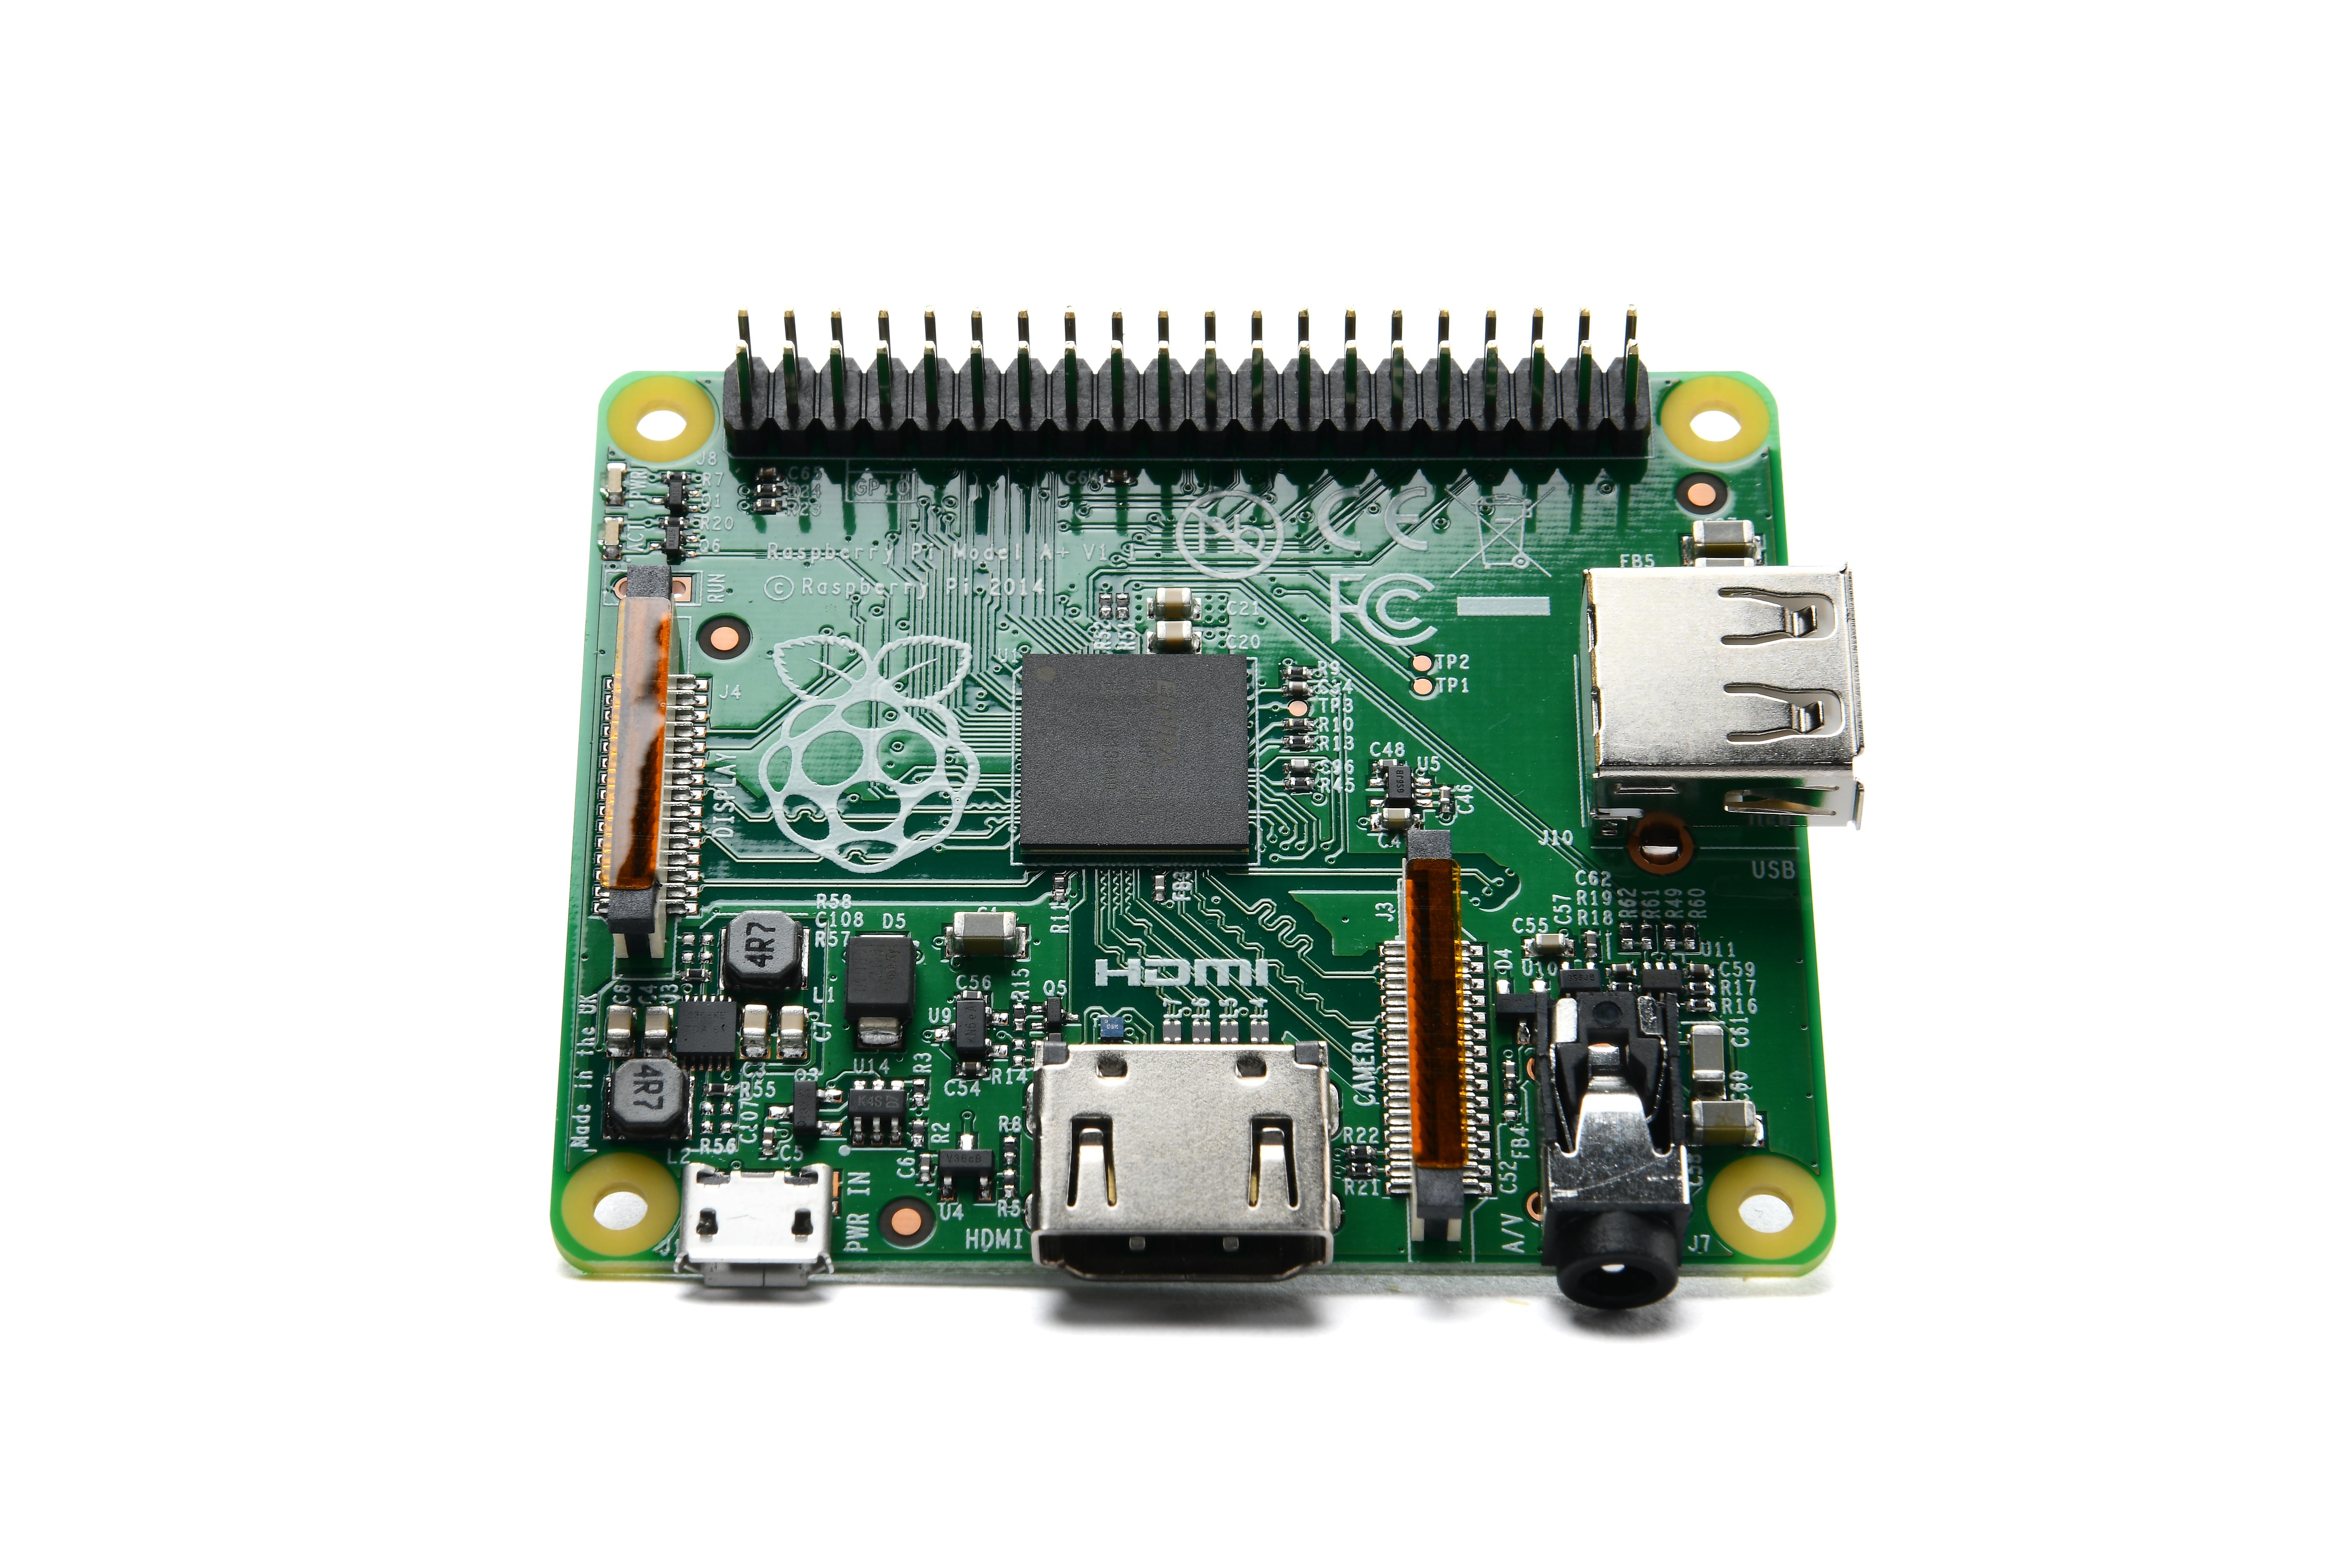 RaspberryPi 3 Model A+